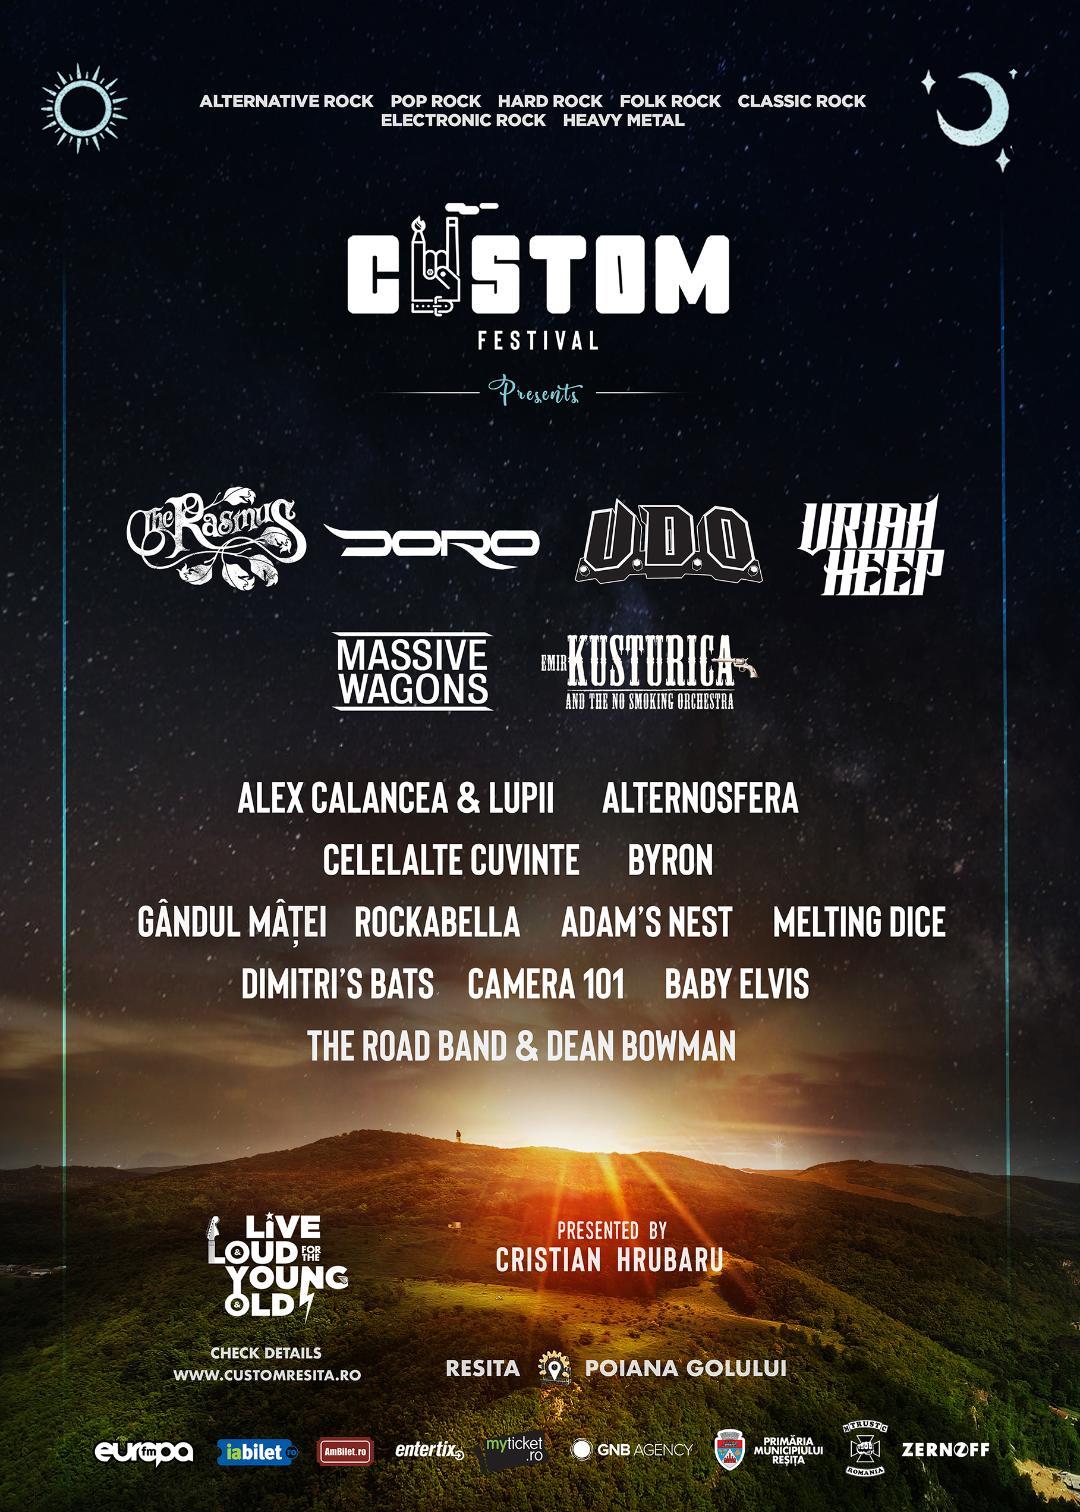 {focus_keyword} Custom Reșița susține și promovează rock-ul românesc Afis Custom Resita Festival